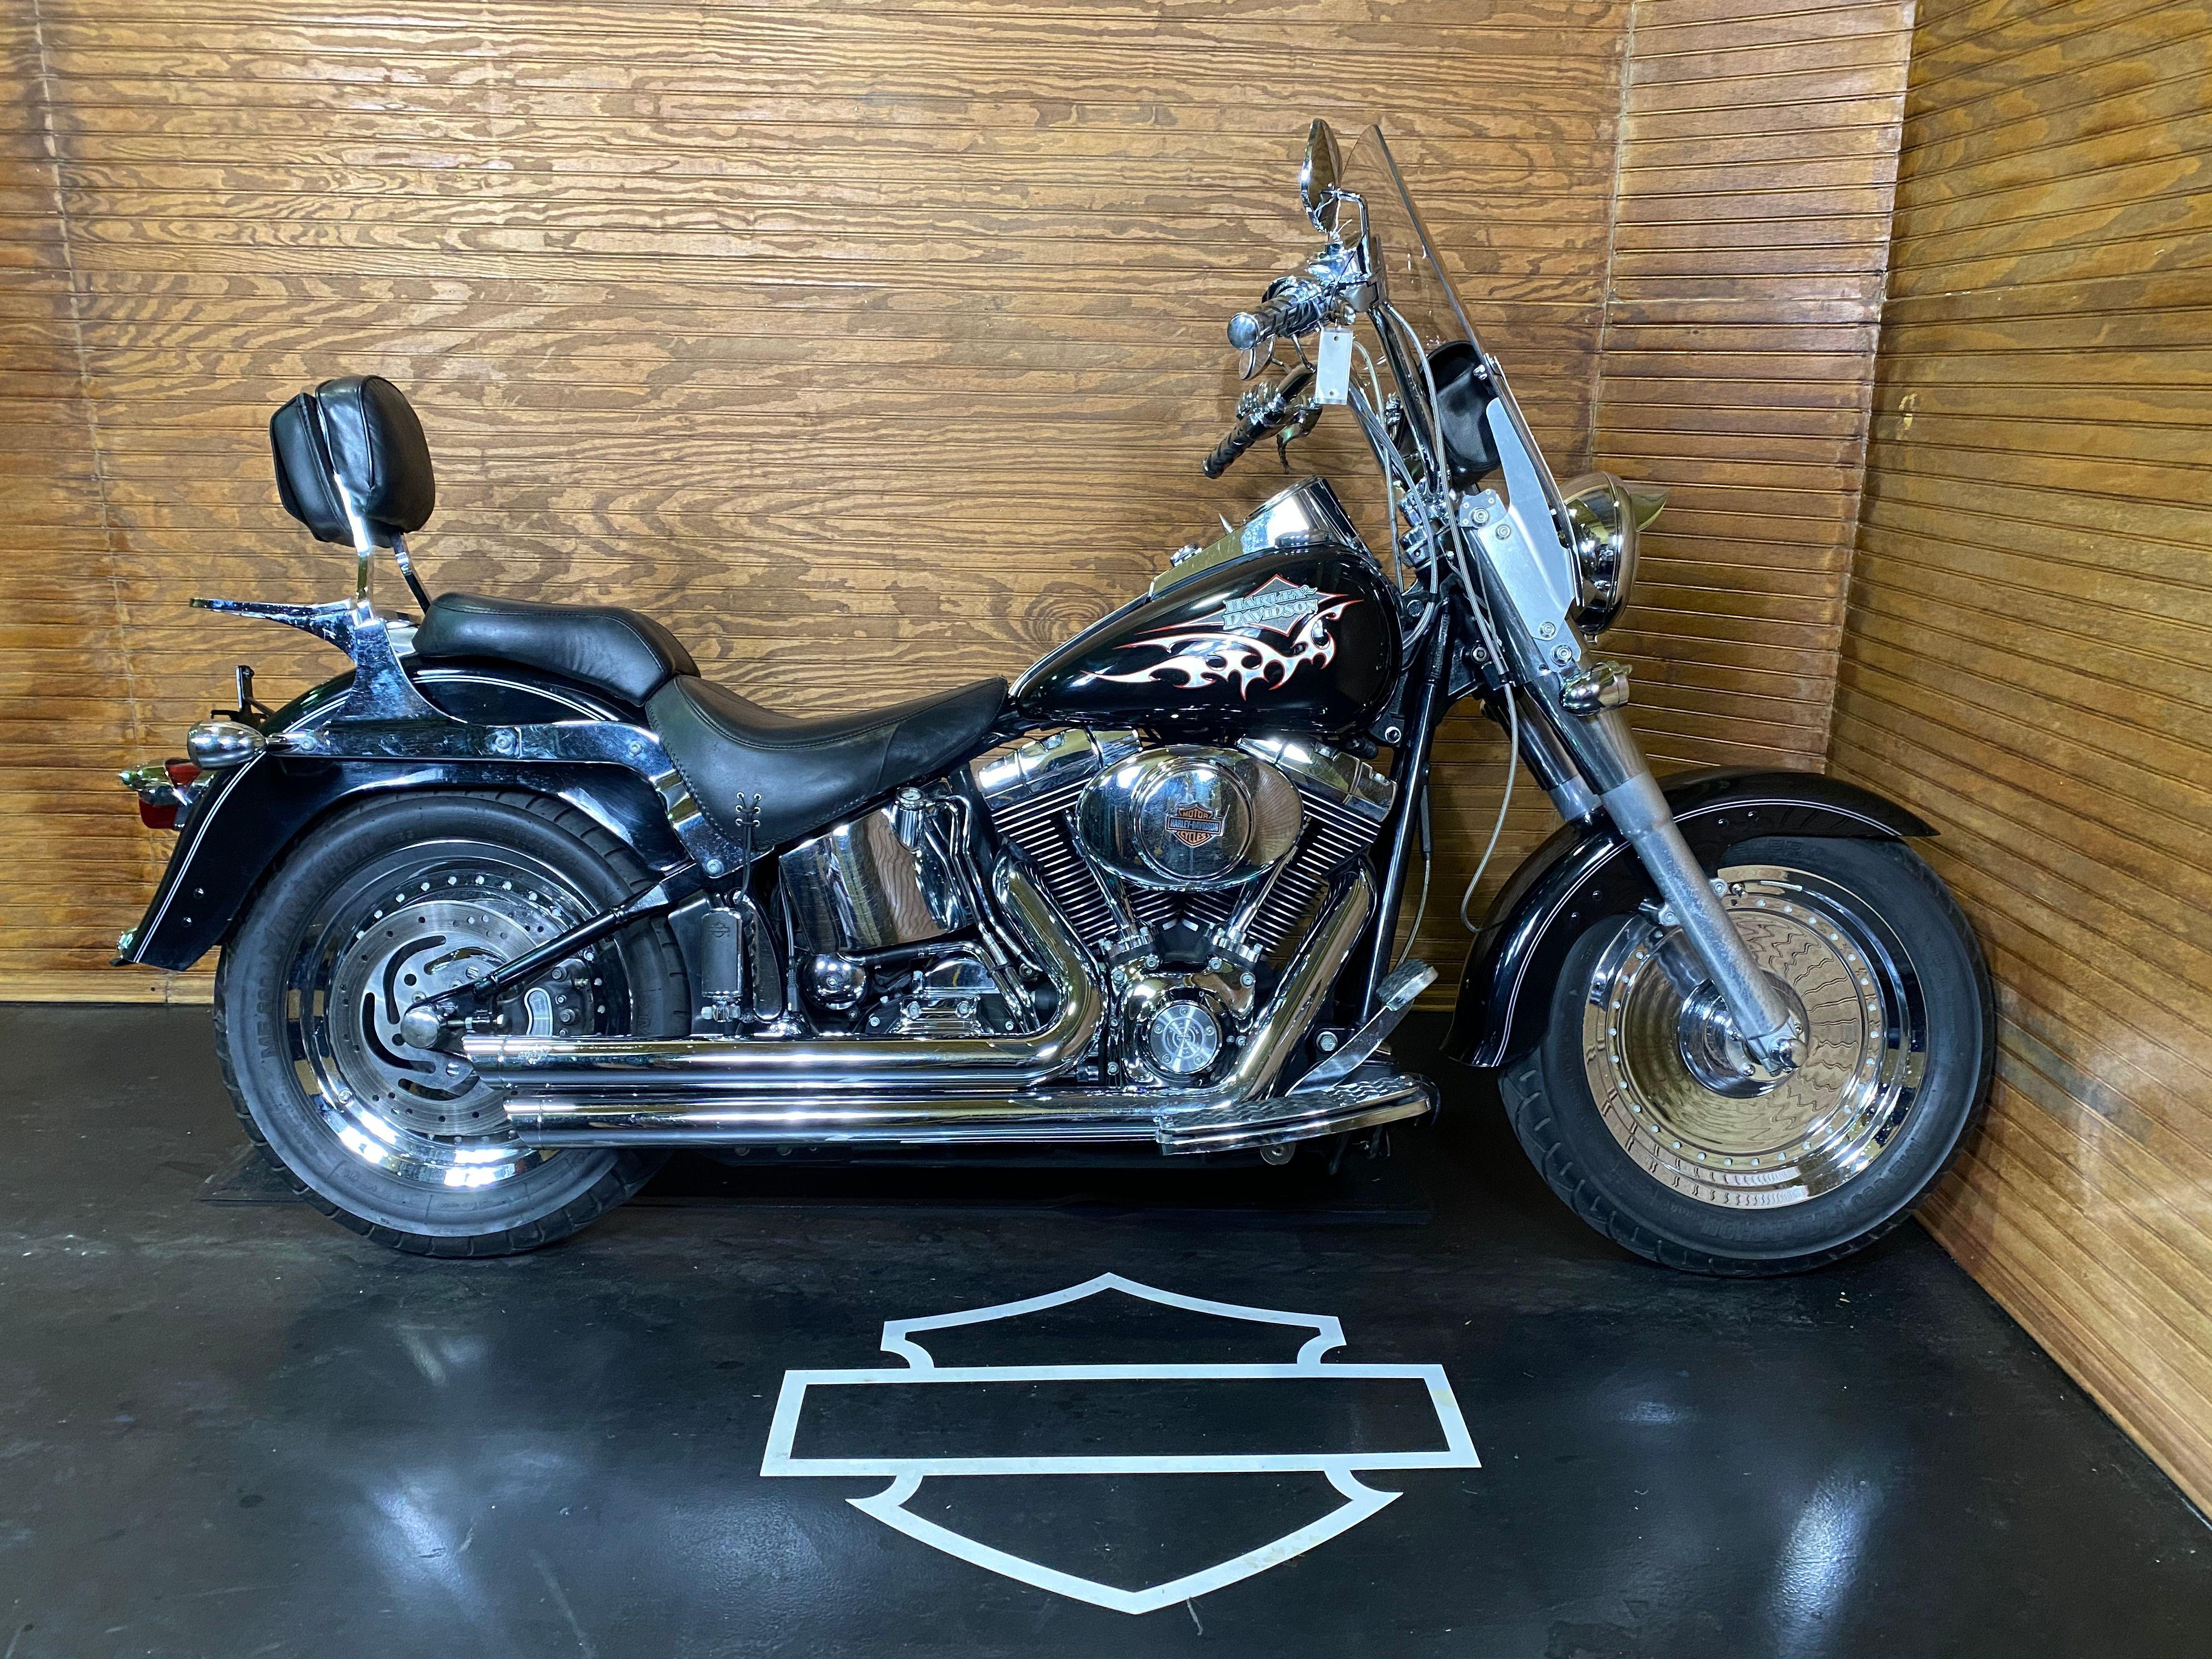 Pre-Owned 2005 Harley-Davidson Fat Boy